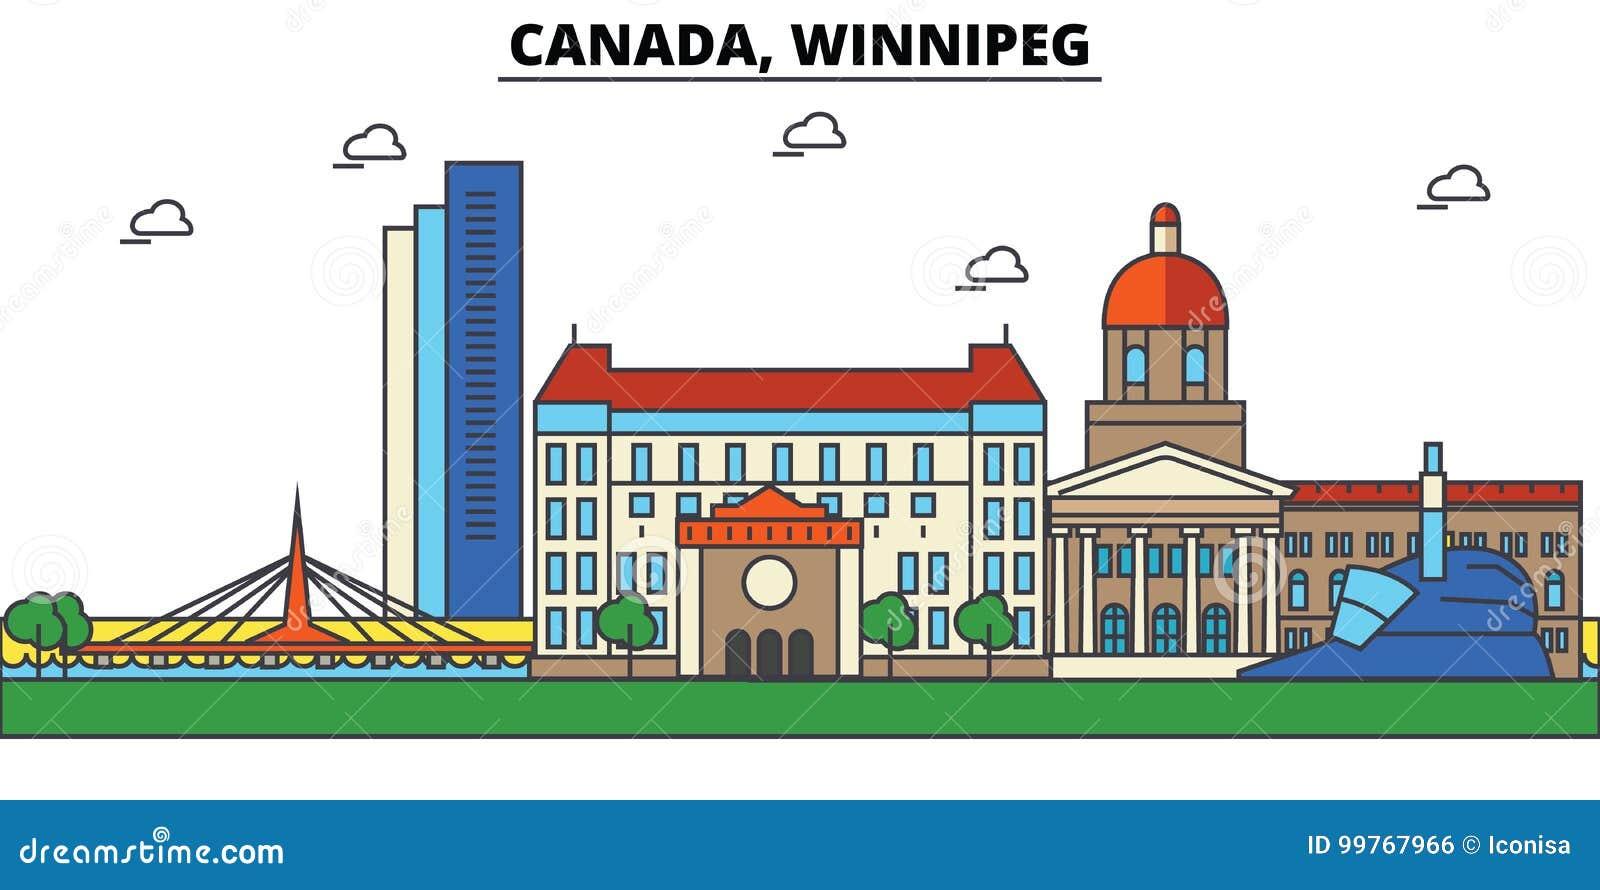 Canada, Winnipeg De architectuur van de stadshorizon